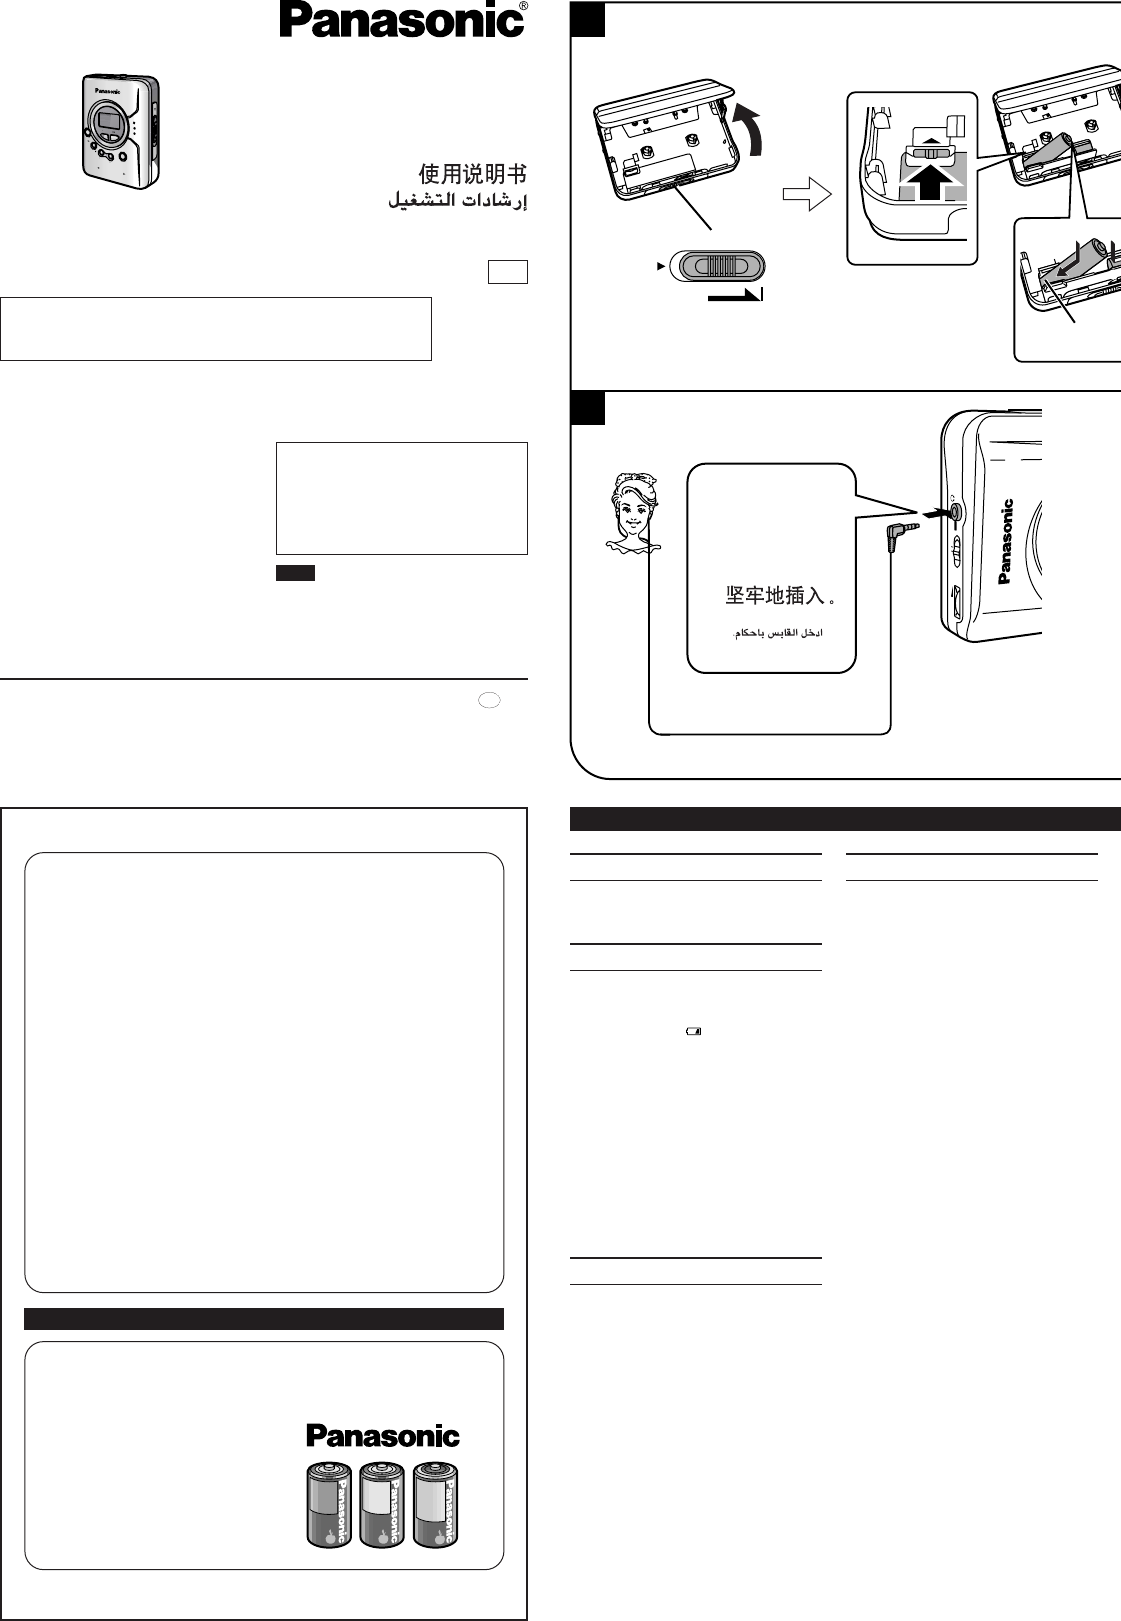 📖 Handleiding Panasonic RQ-SX58 (6 pagina's)